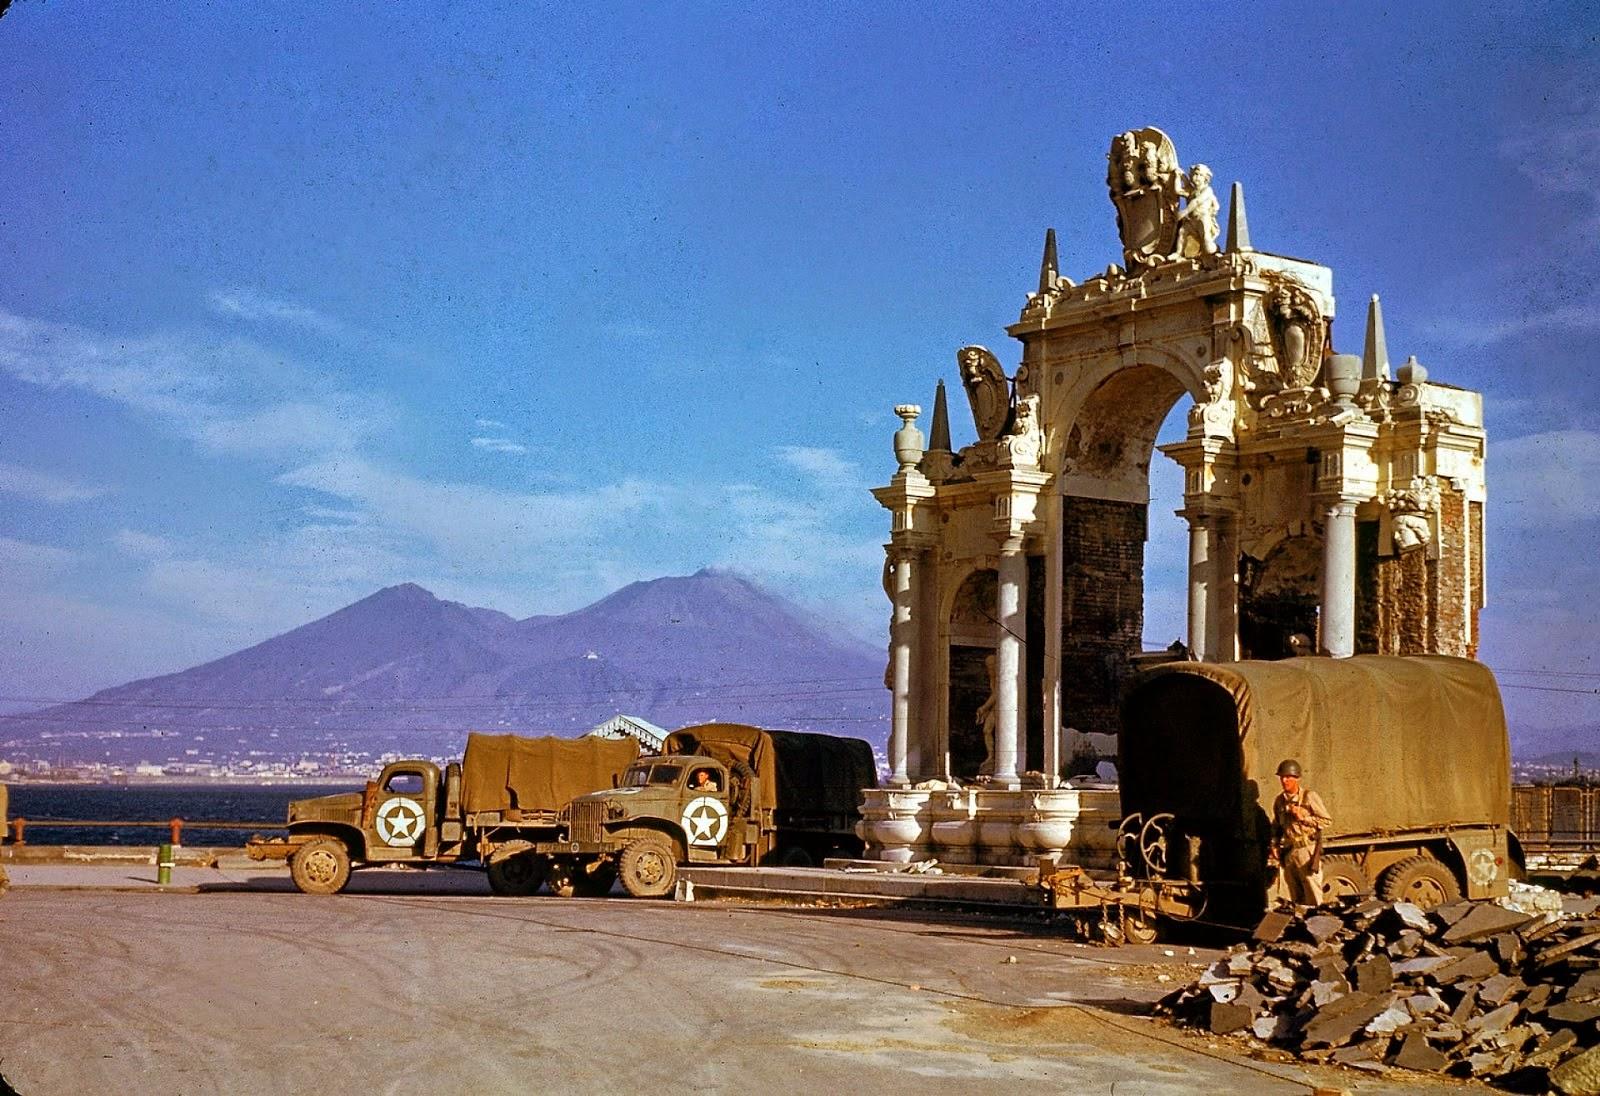 http://3.bp.blogspot.com/-Q-sxLSaqBwA/VLaaBjcC8wI/AAAAAAABOKA/OWvvx2u4LQI/s1600/Rare+Color+Photographs+from+World+War+II+(14).jpg